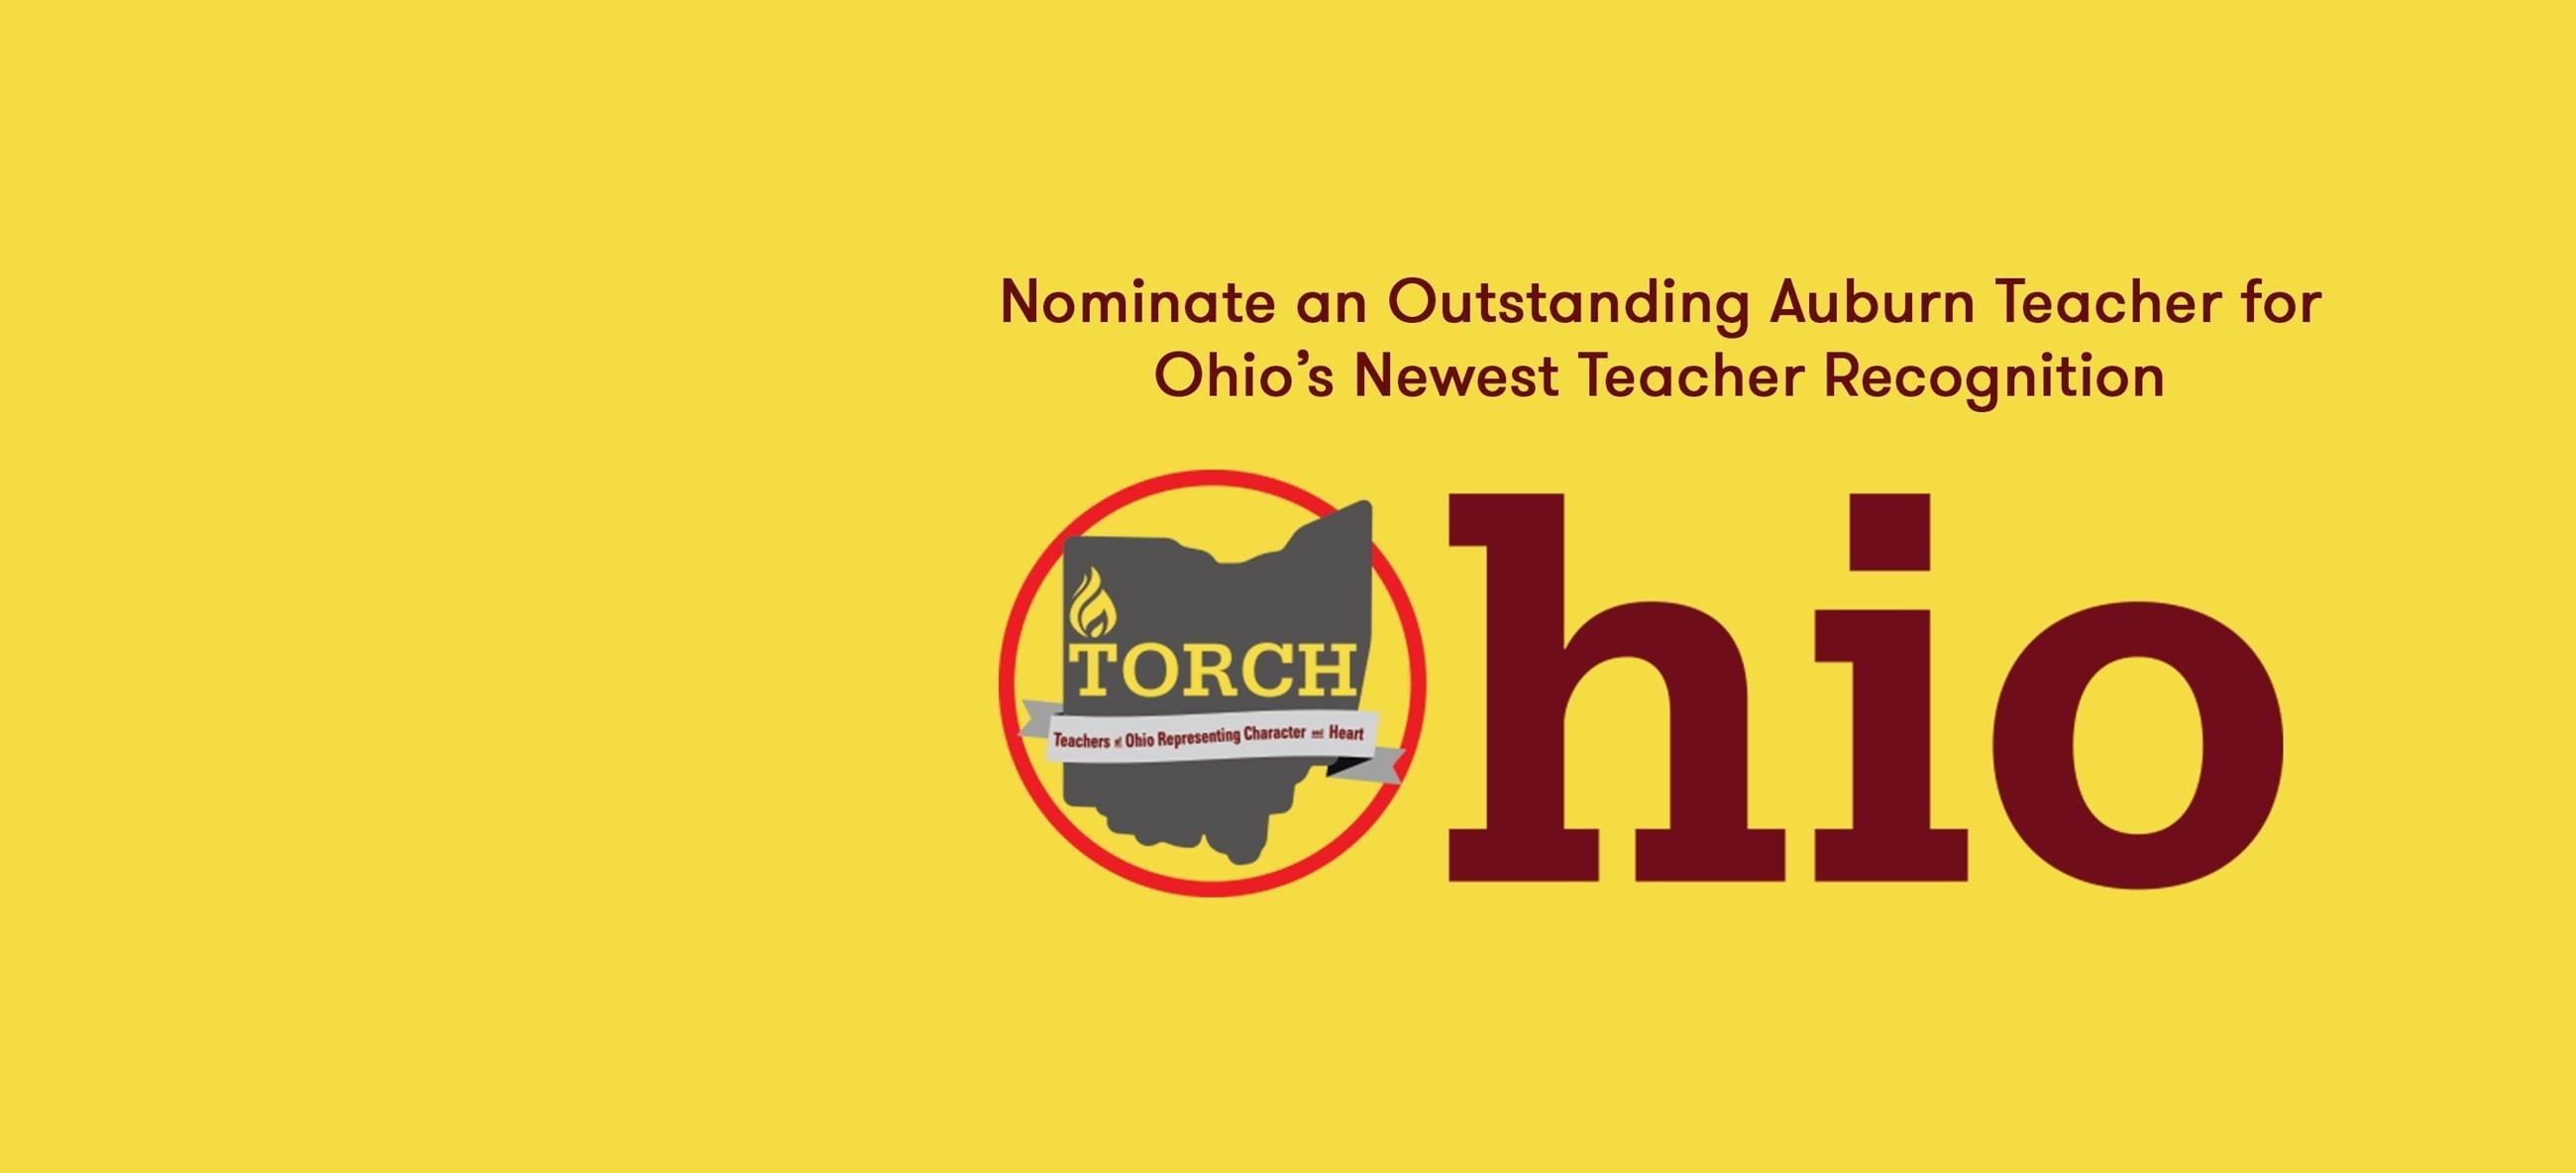 Ohio TORCH logo for teacher nomination